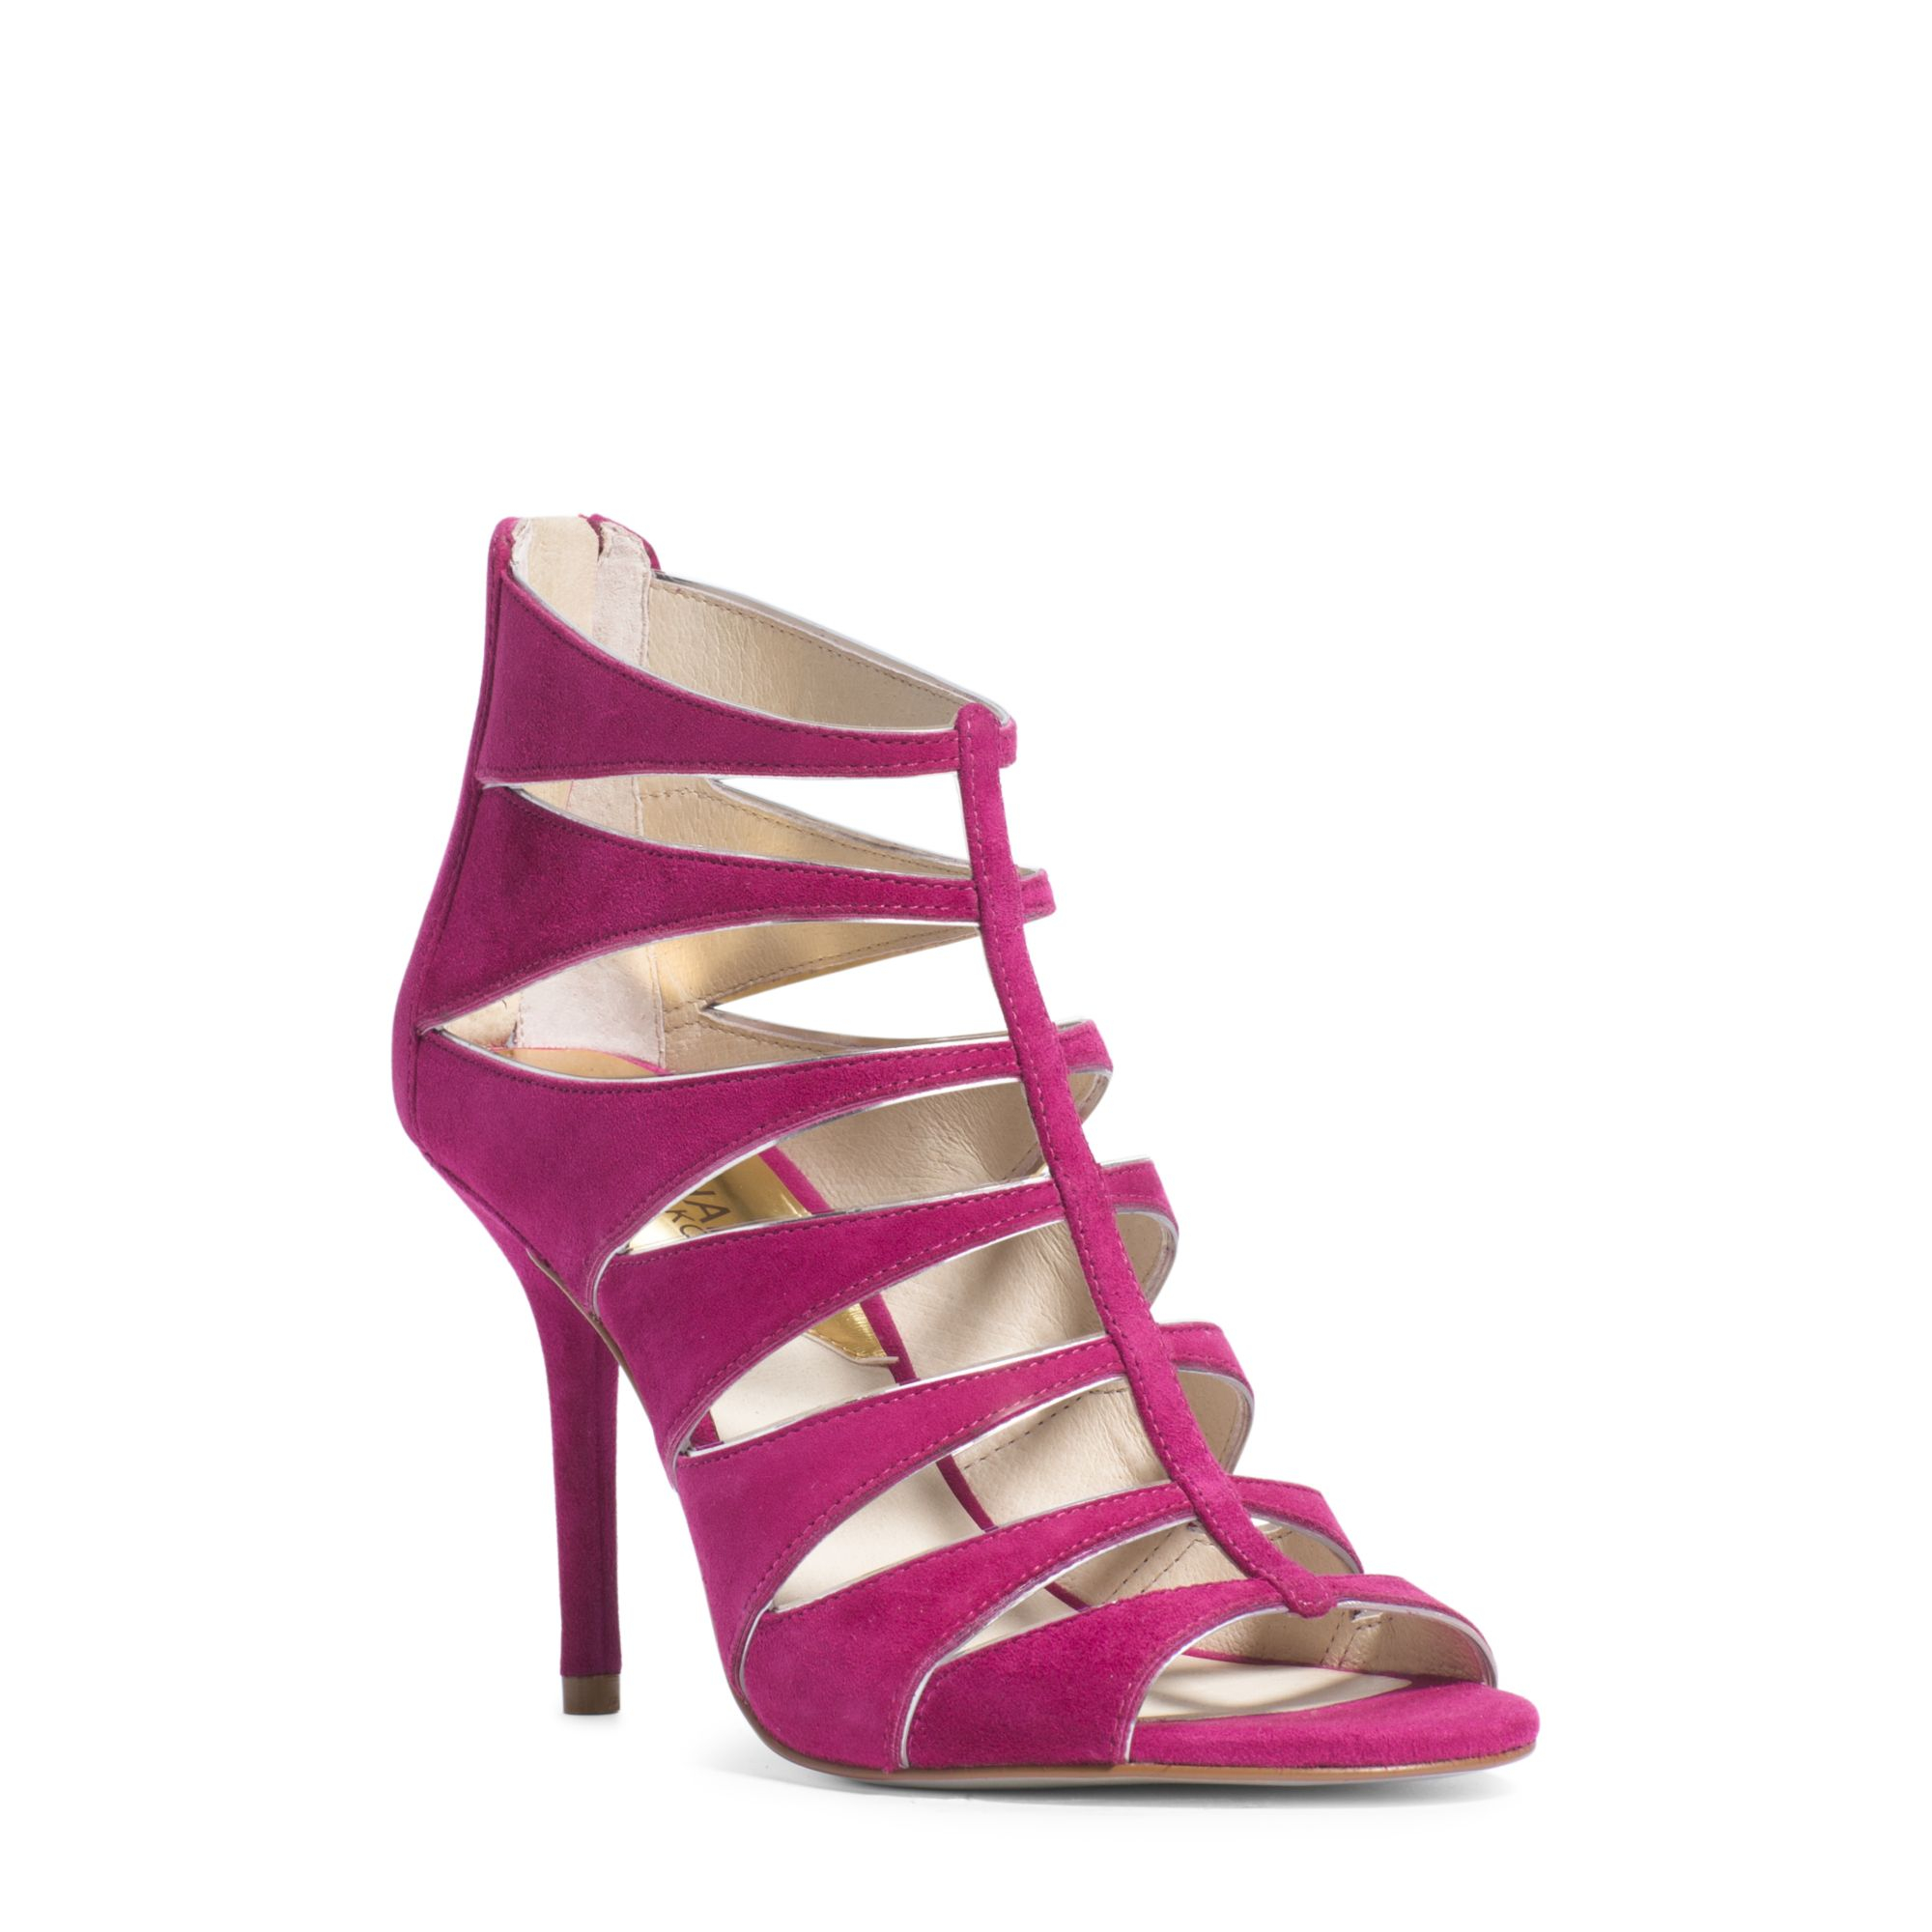 192fabb8b99 Michael Kors Pink Mavis Open Toe